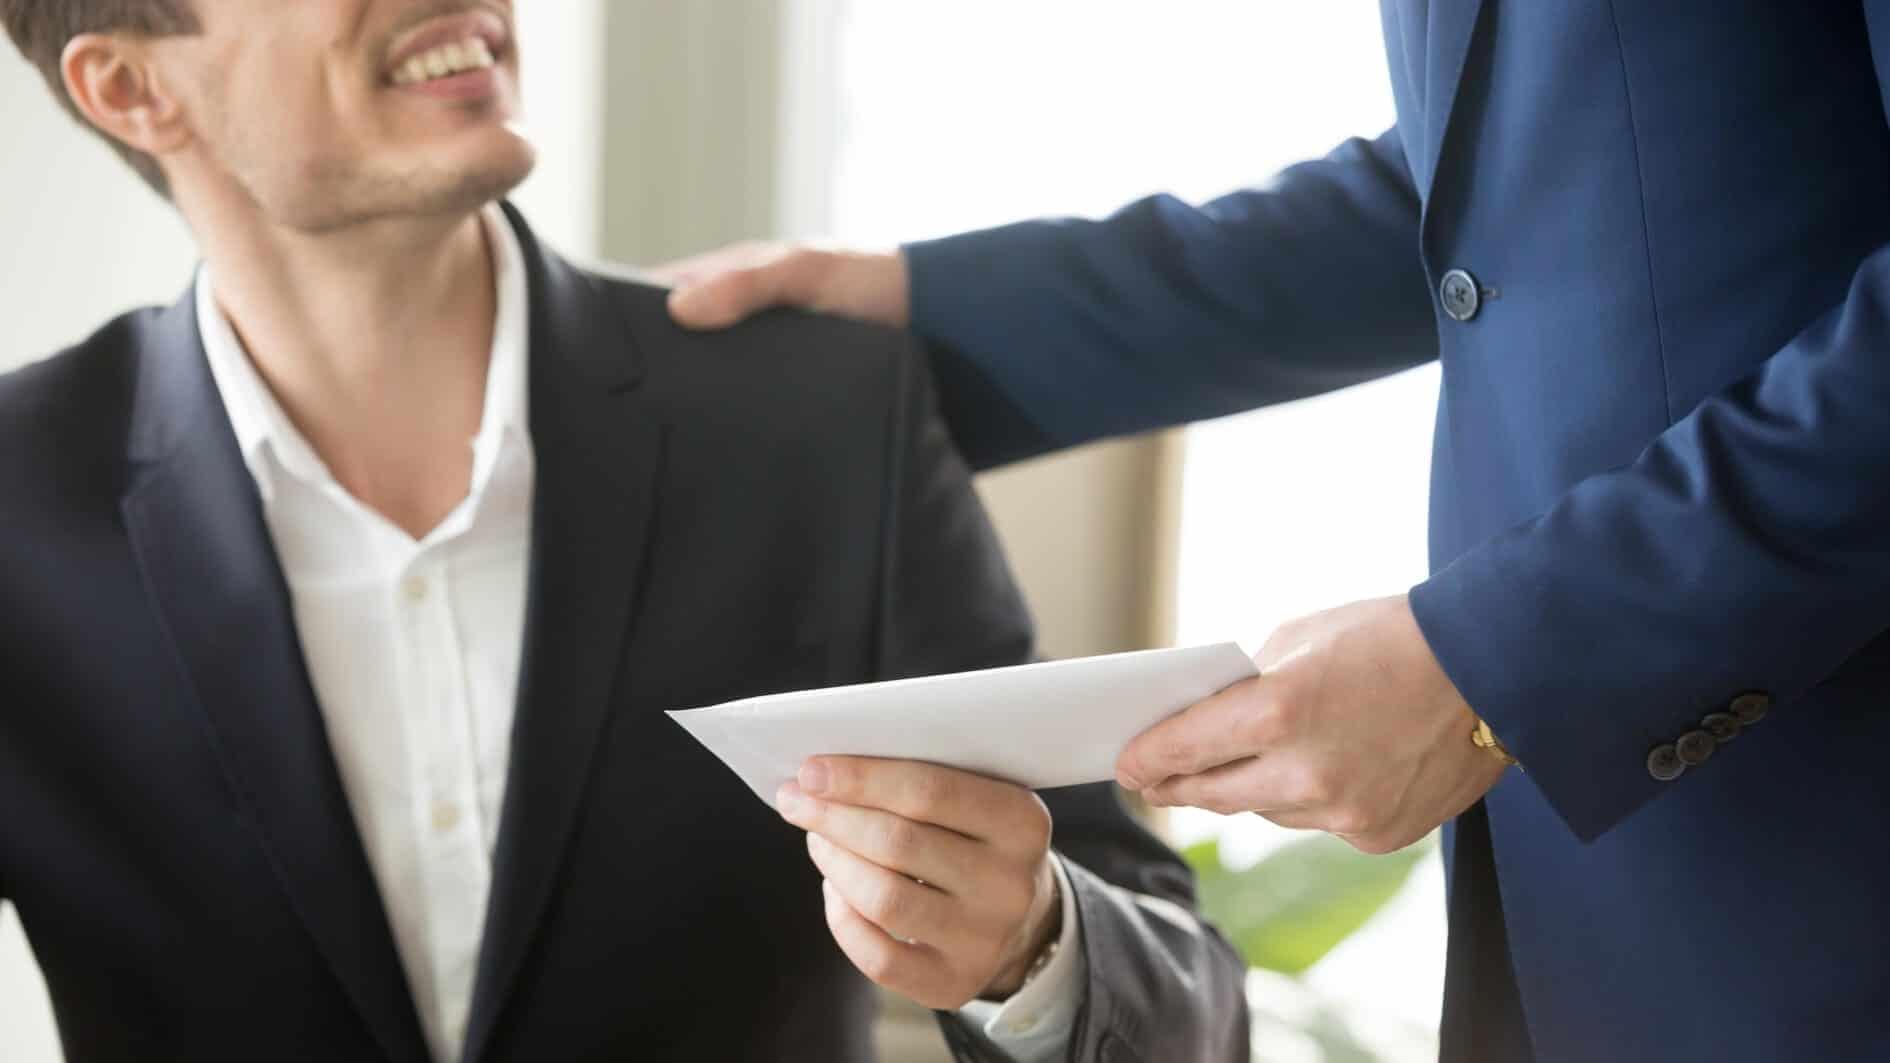 Mengenal Jenis-Jenis Bonus yang Dapat Diterima Karyawan